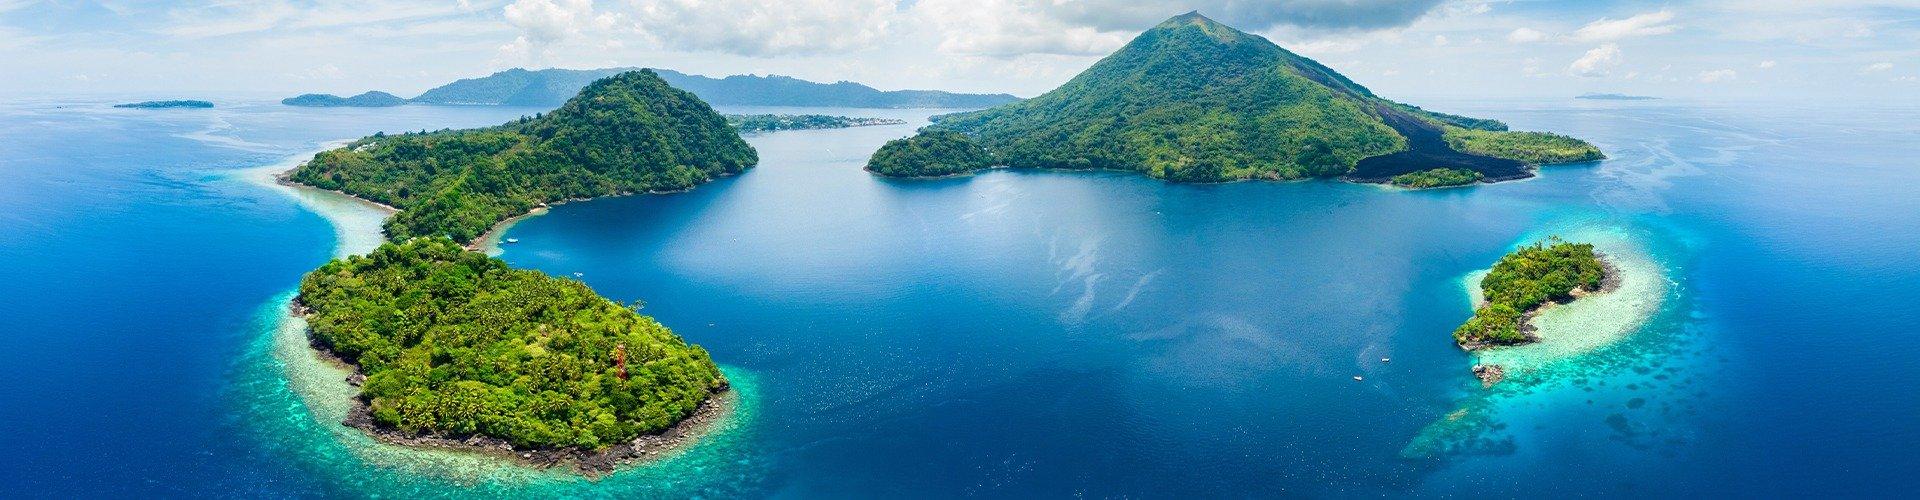 Familienurlaub in Indonesien